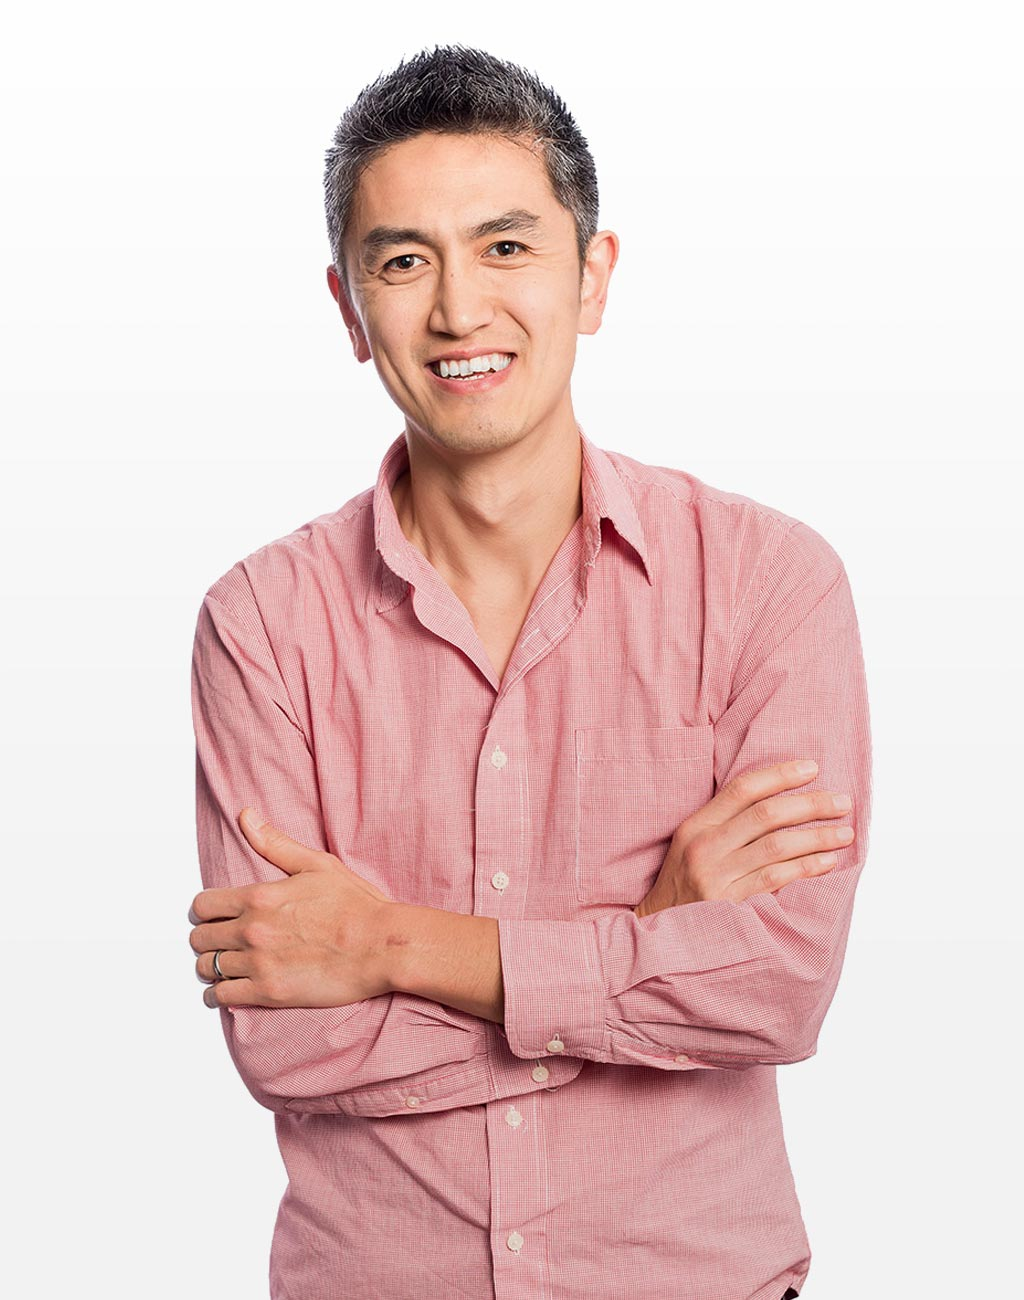 Daniel Eiem